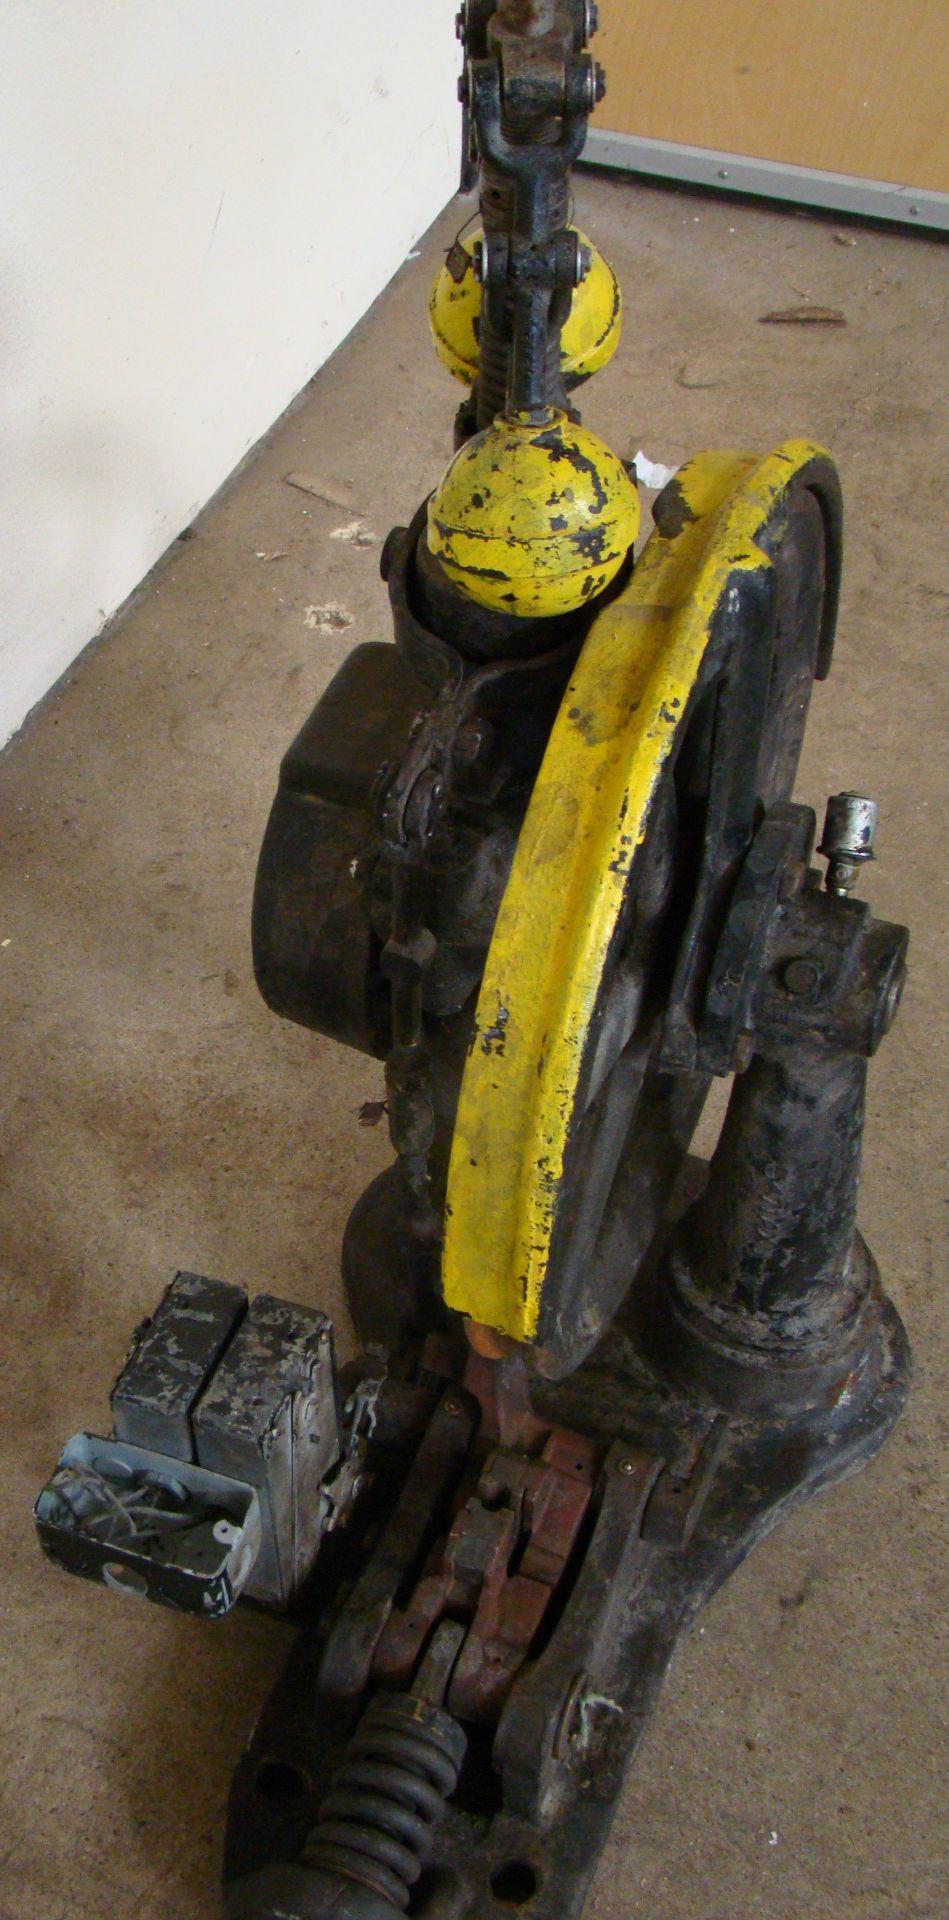 Lot 37 - Antique Otis Elevator Safety Governor Brake, Cast Iron Brass Steampunk Carspeed, 700 FPM